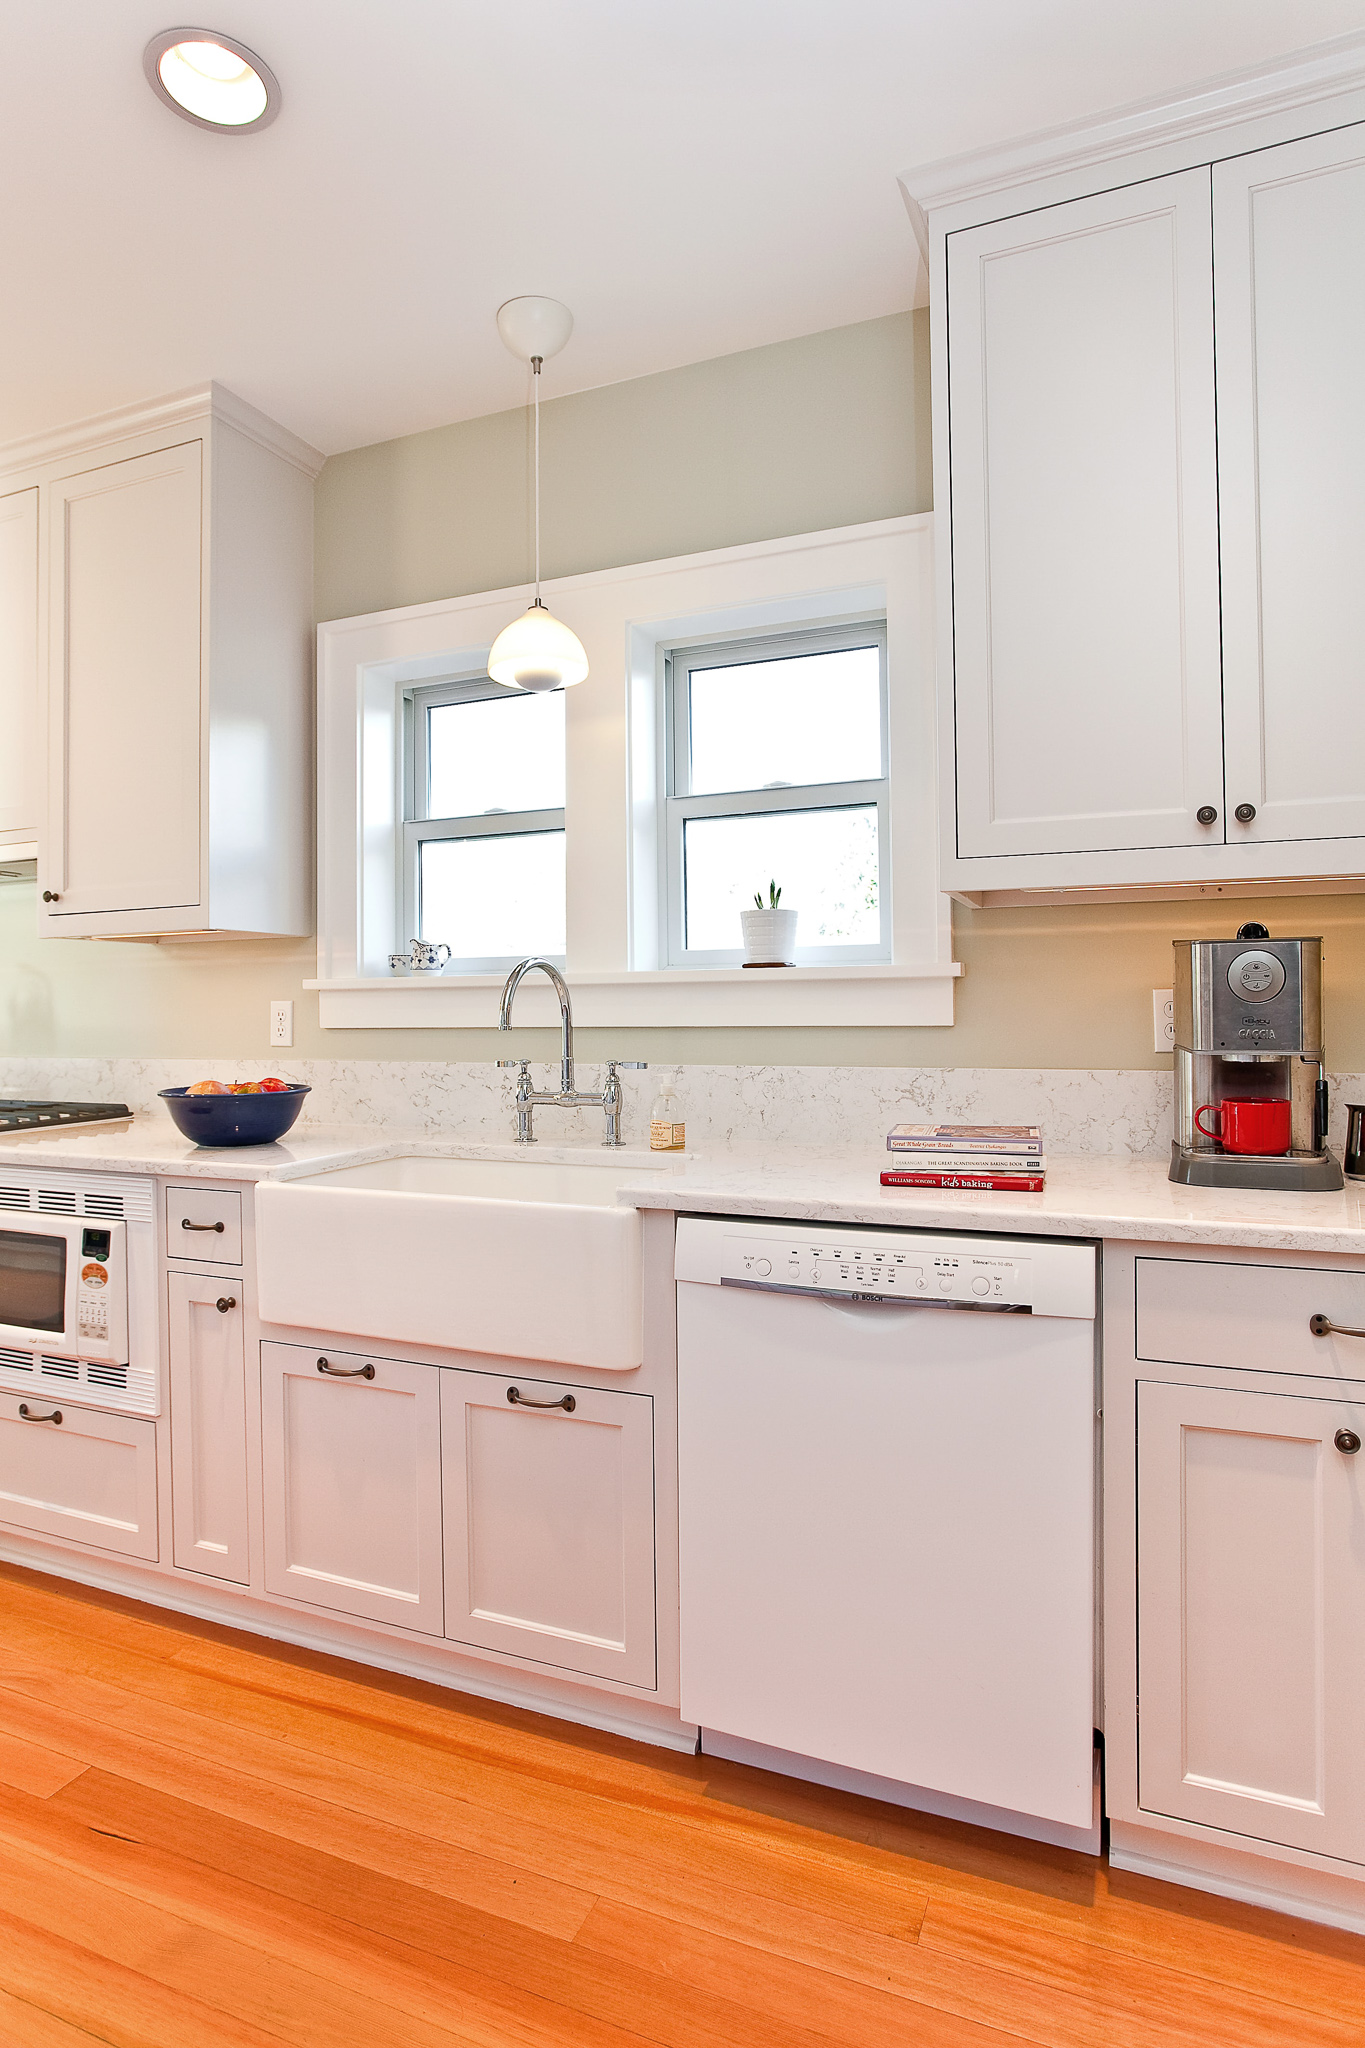 BALLARD Kitchen and Mudroom Remodel 4.jpg